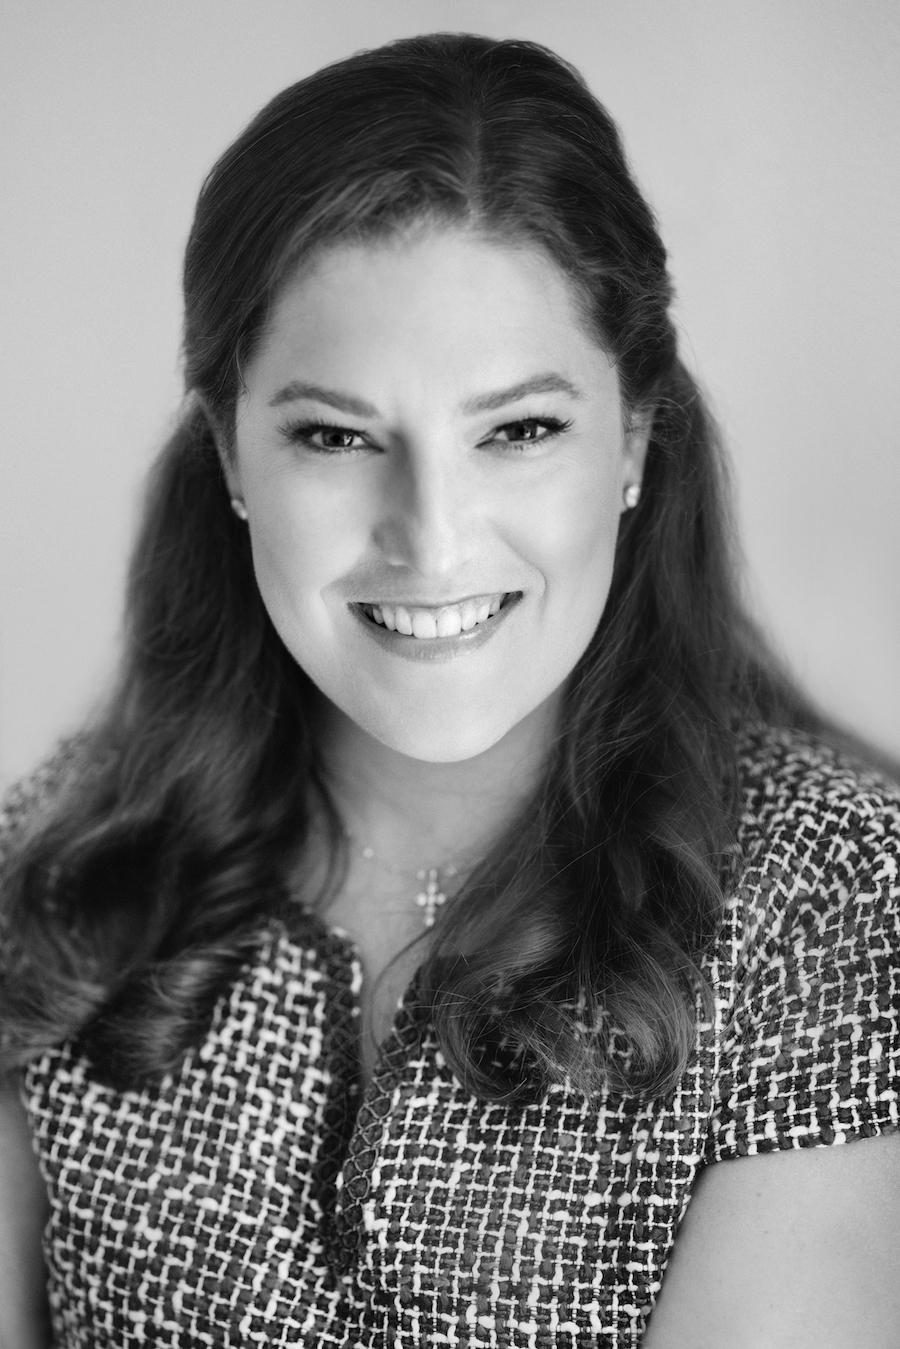 Katherine Mathes Bullock